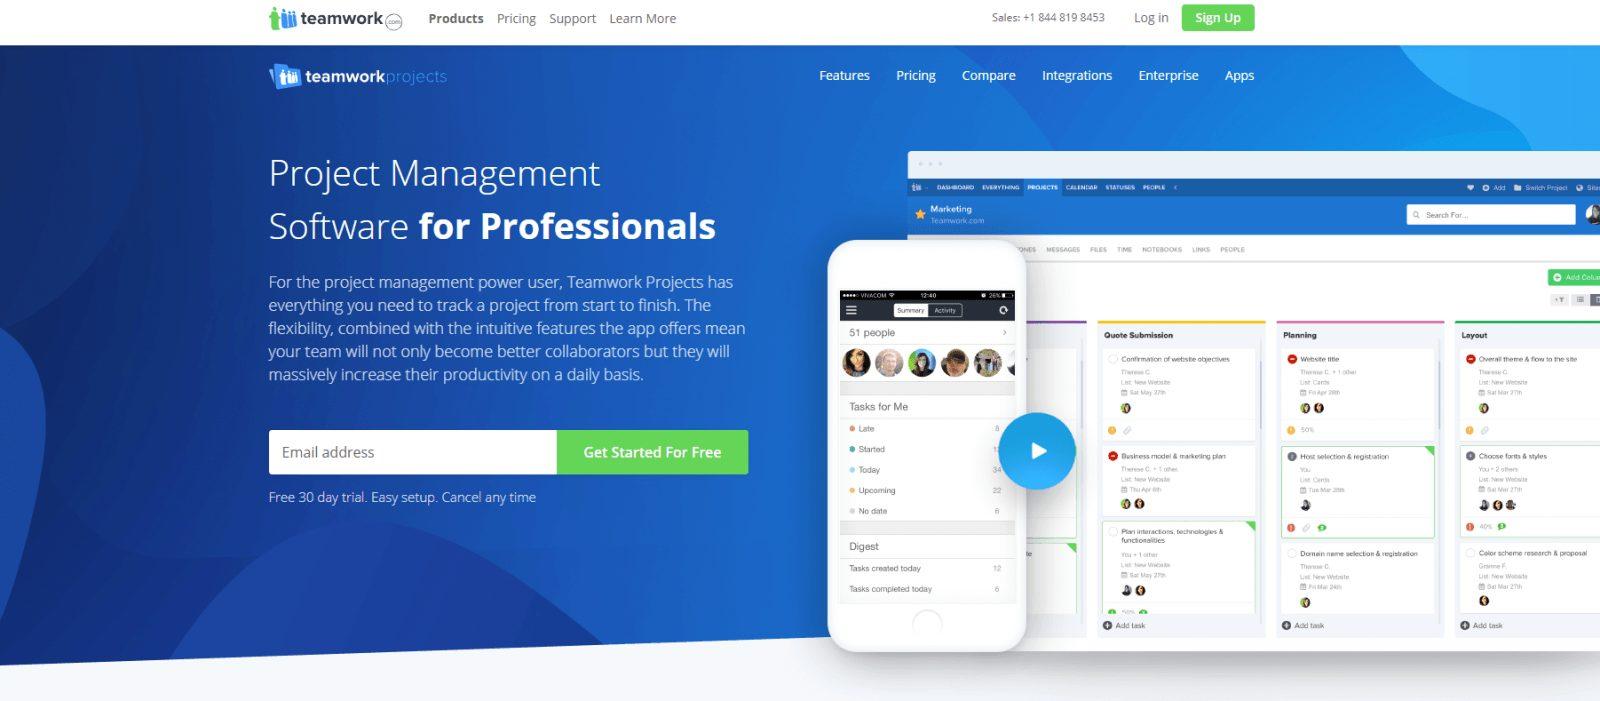 teamwork virtual introduction